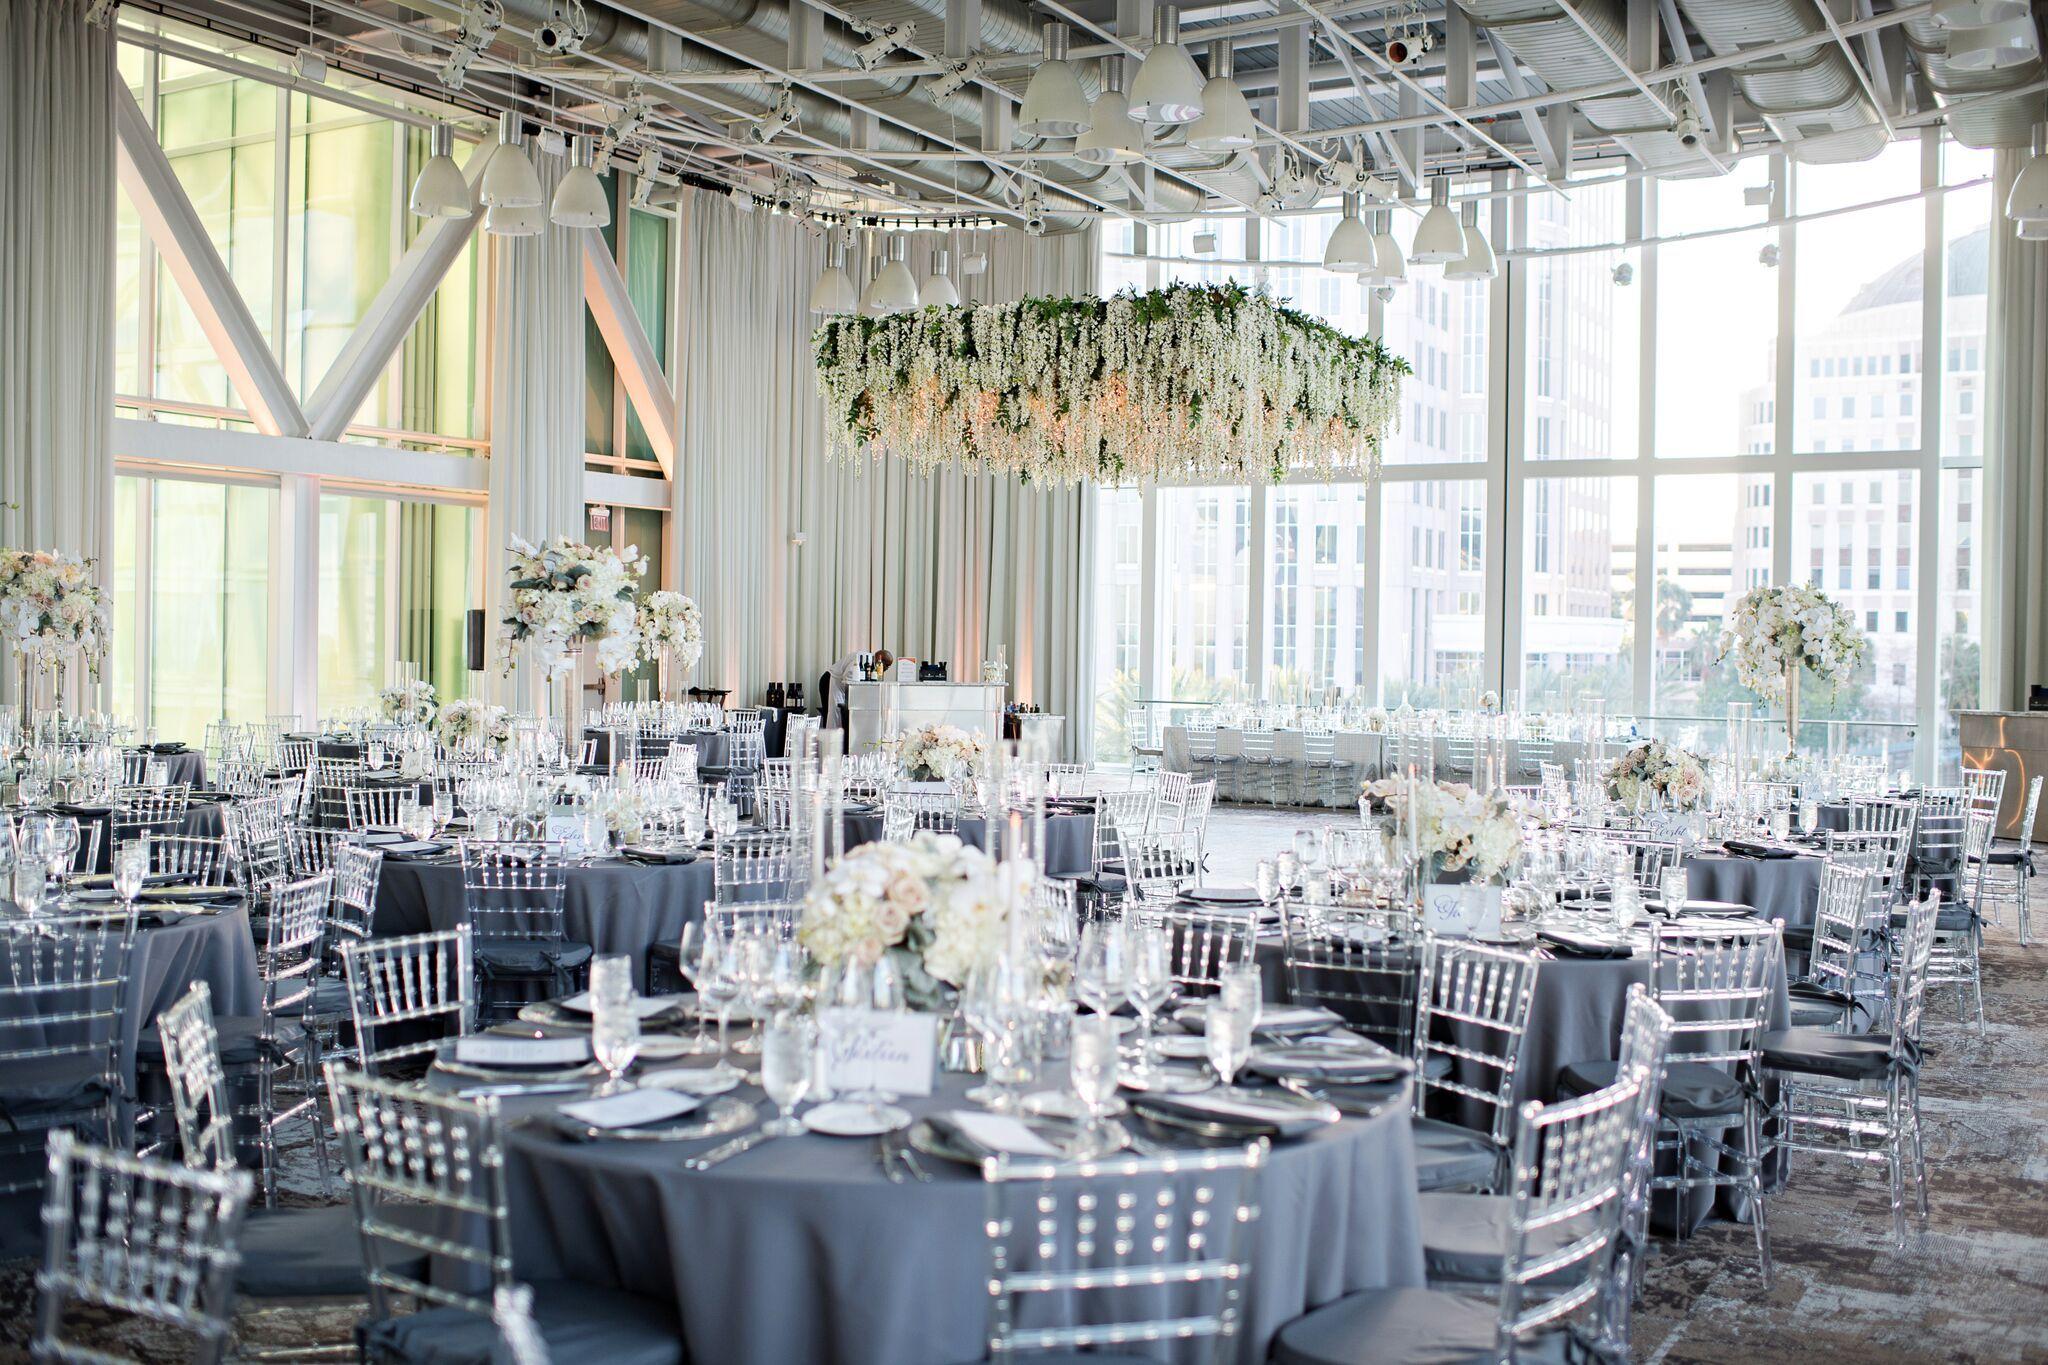 Clear Chiavari Chairs Orlando Wedding And Party Rentals Orlando Wedding Orlando Wedding Reception Wedding Rentals